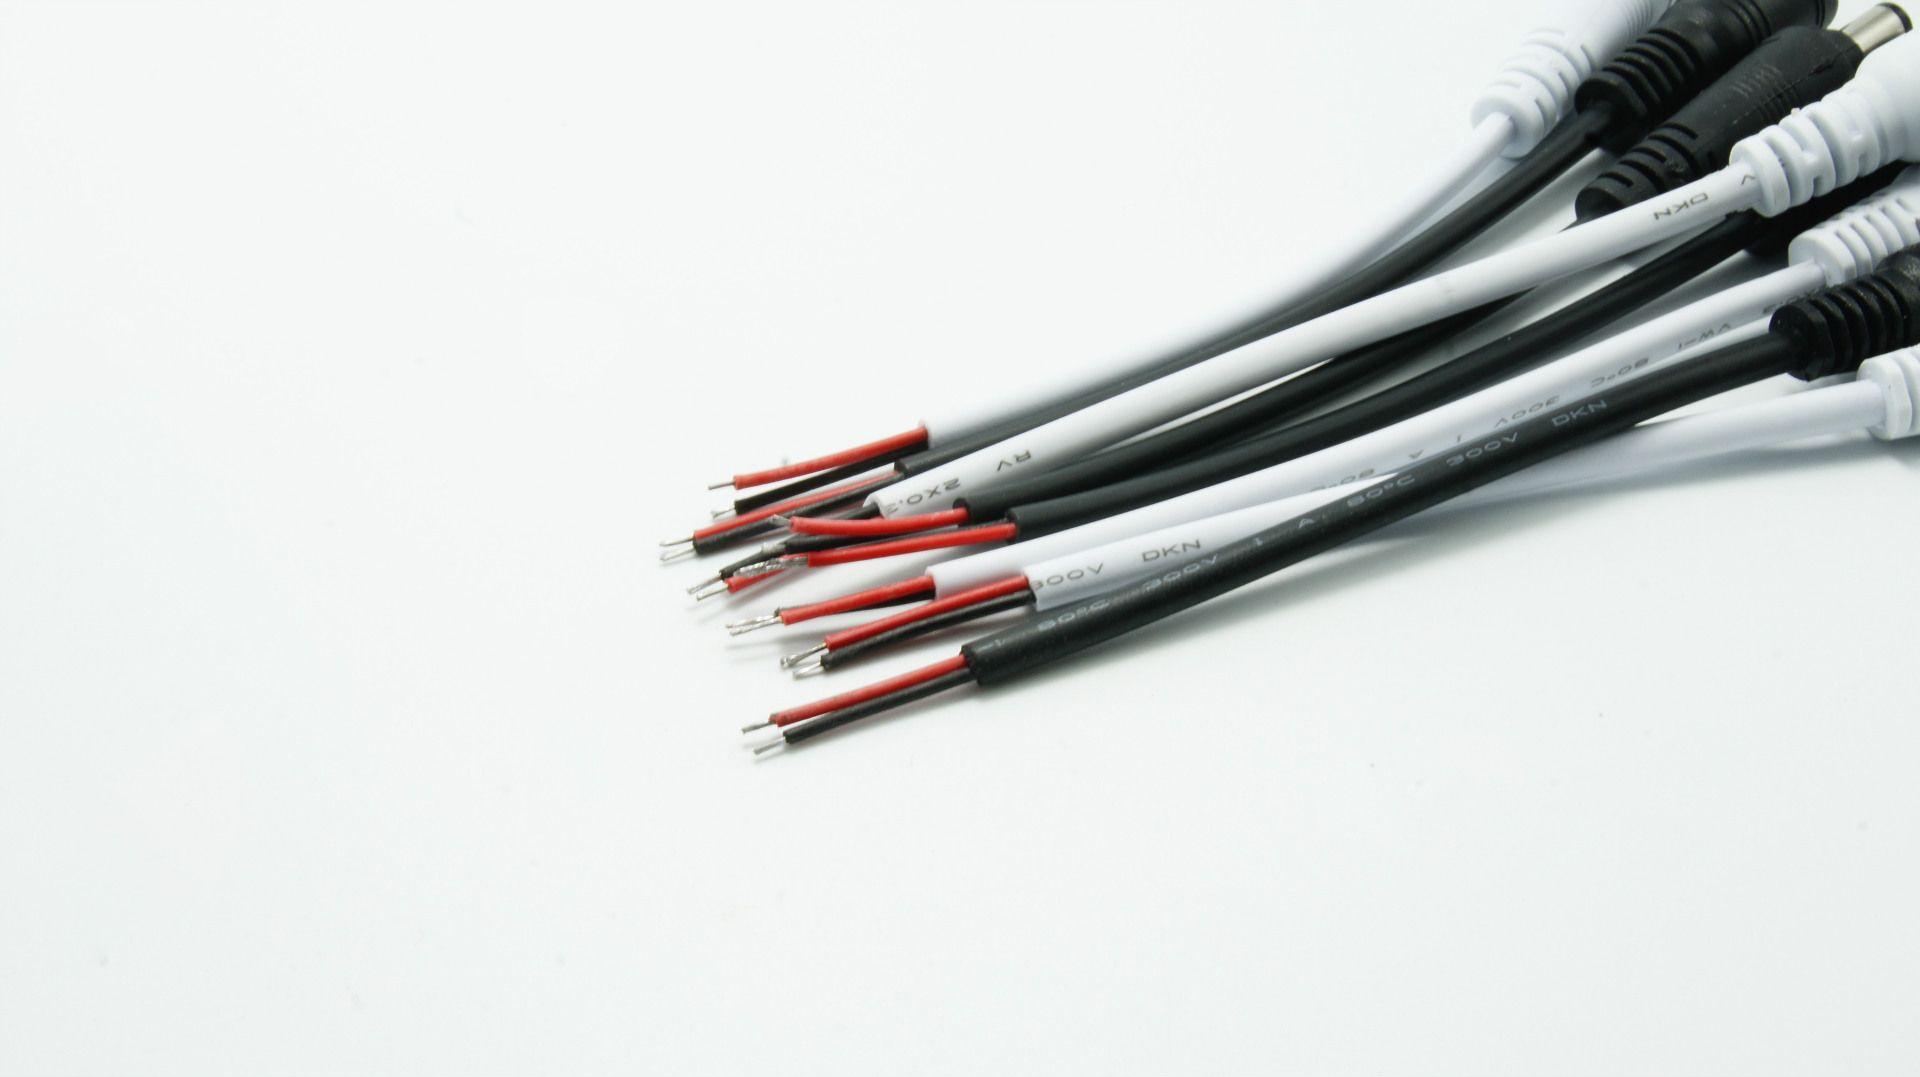 Conector de cable de CC, enchufe de 15 cm para luces LED y tira de LED Conector de línea de alimentación de 5.5mmx2.1mm + Bloqueo